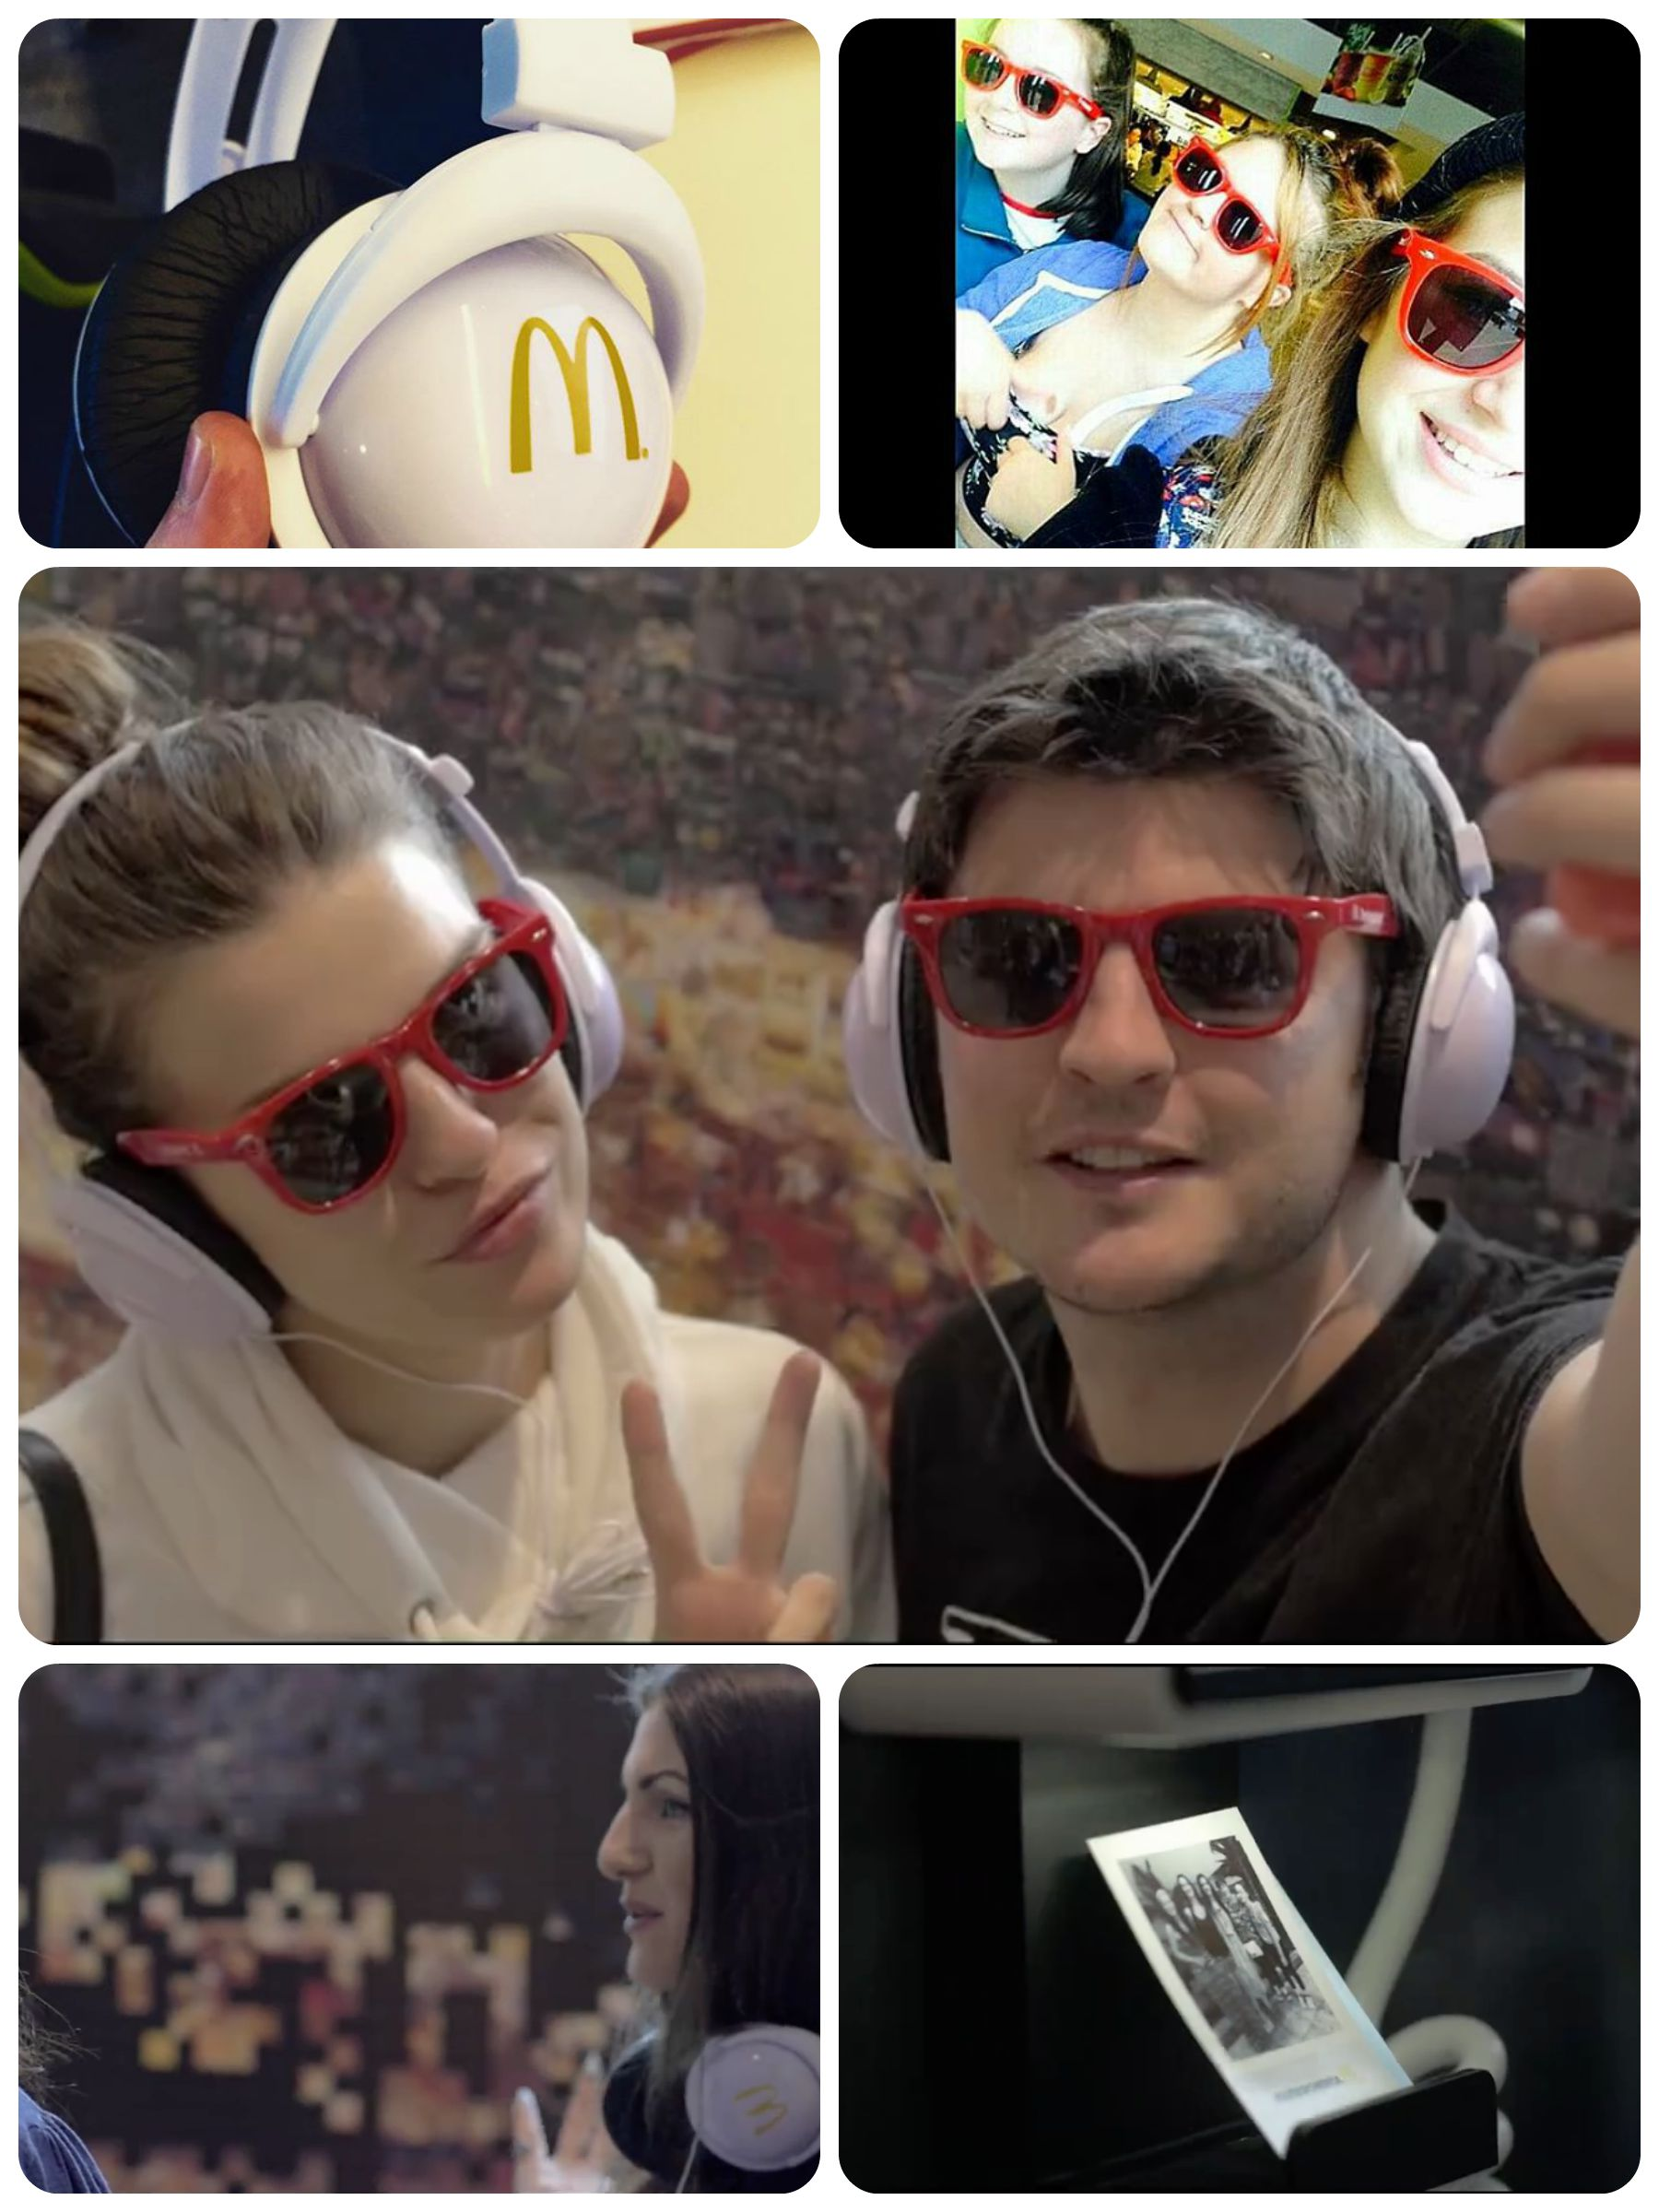 Mc Donalds Collage 4.jpg